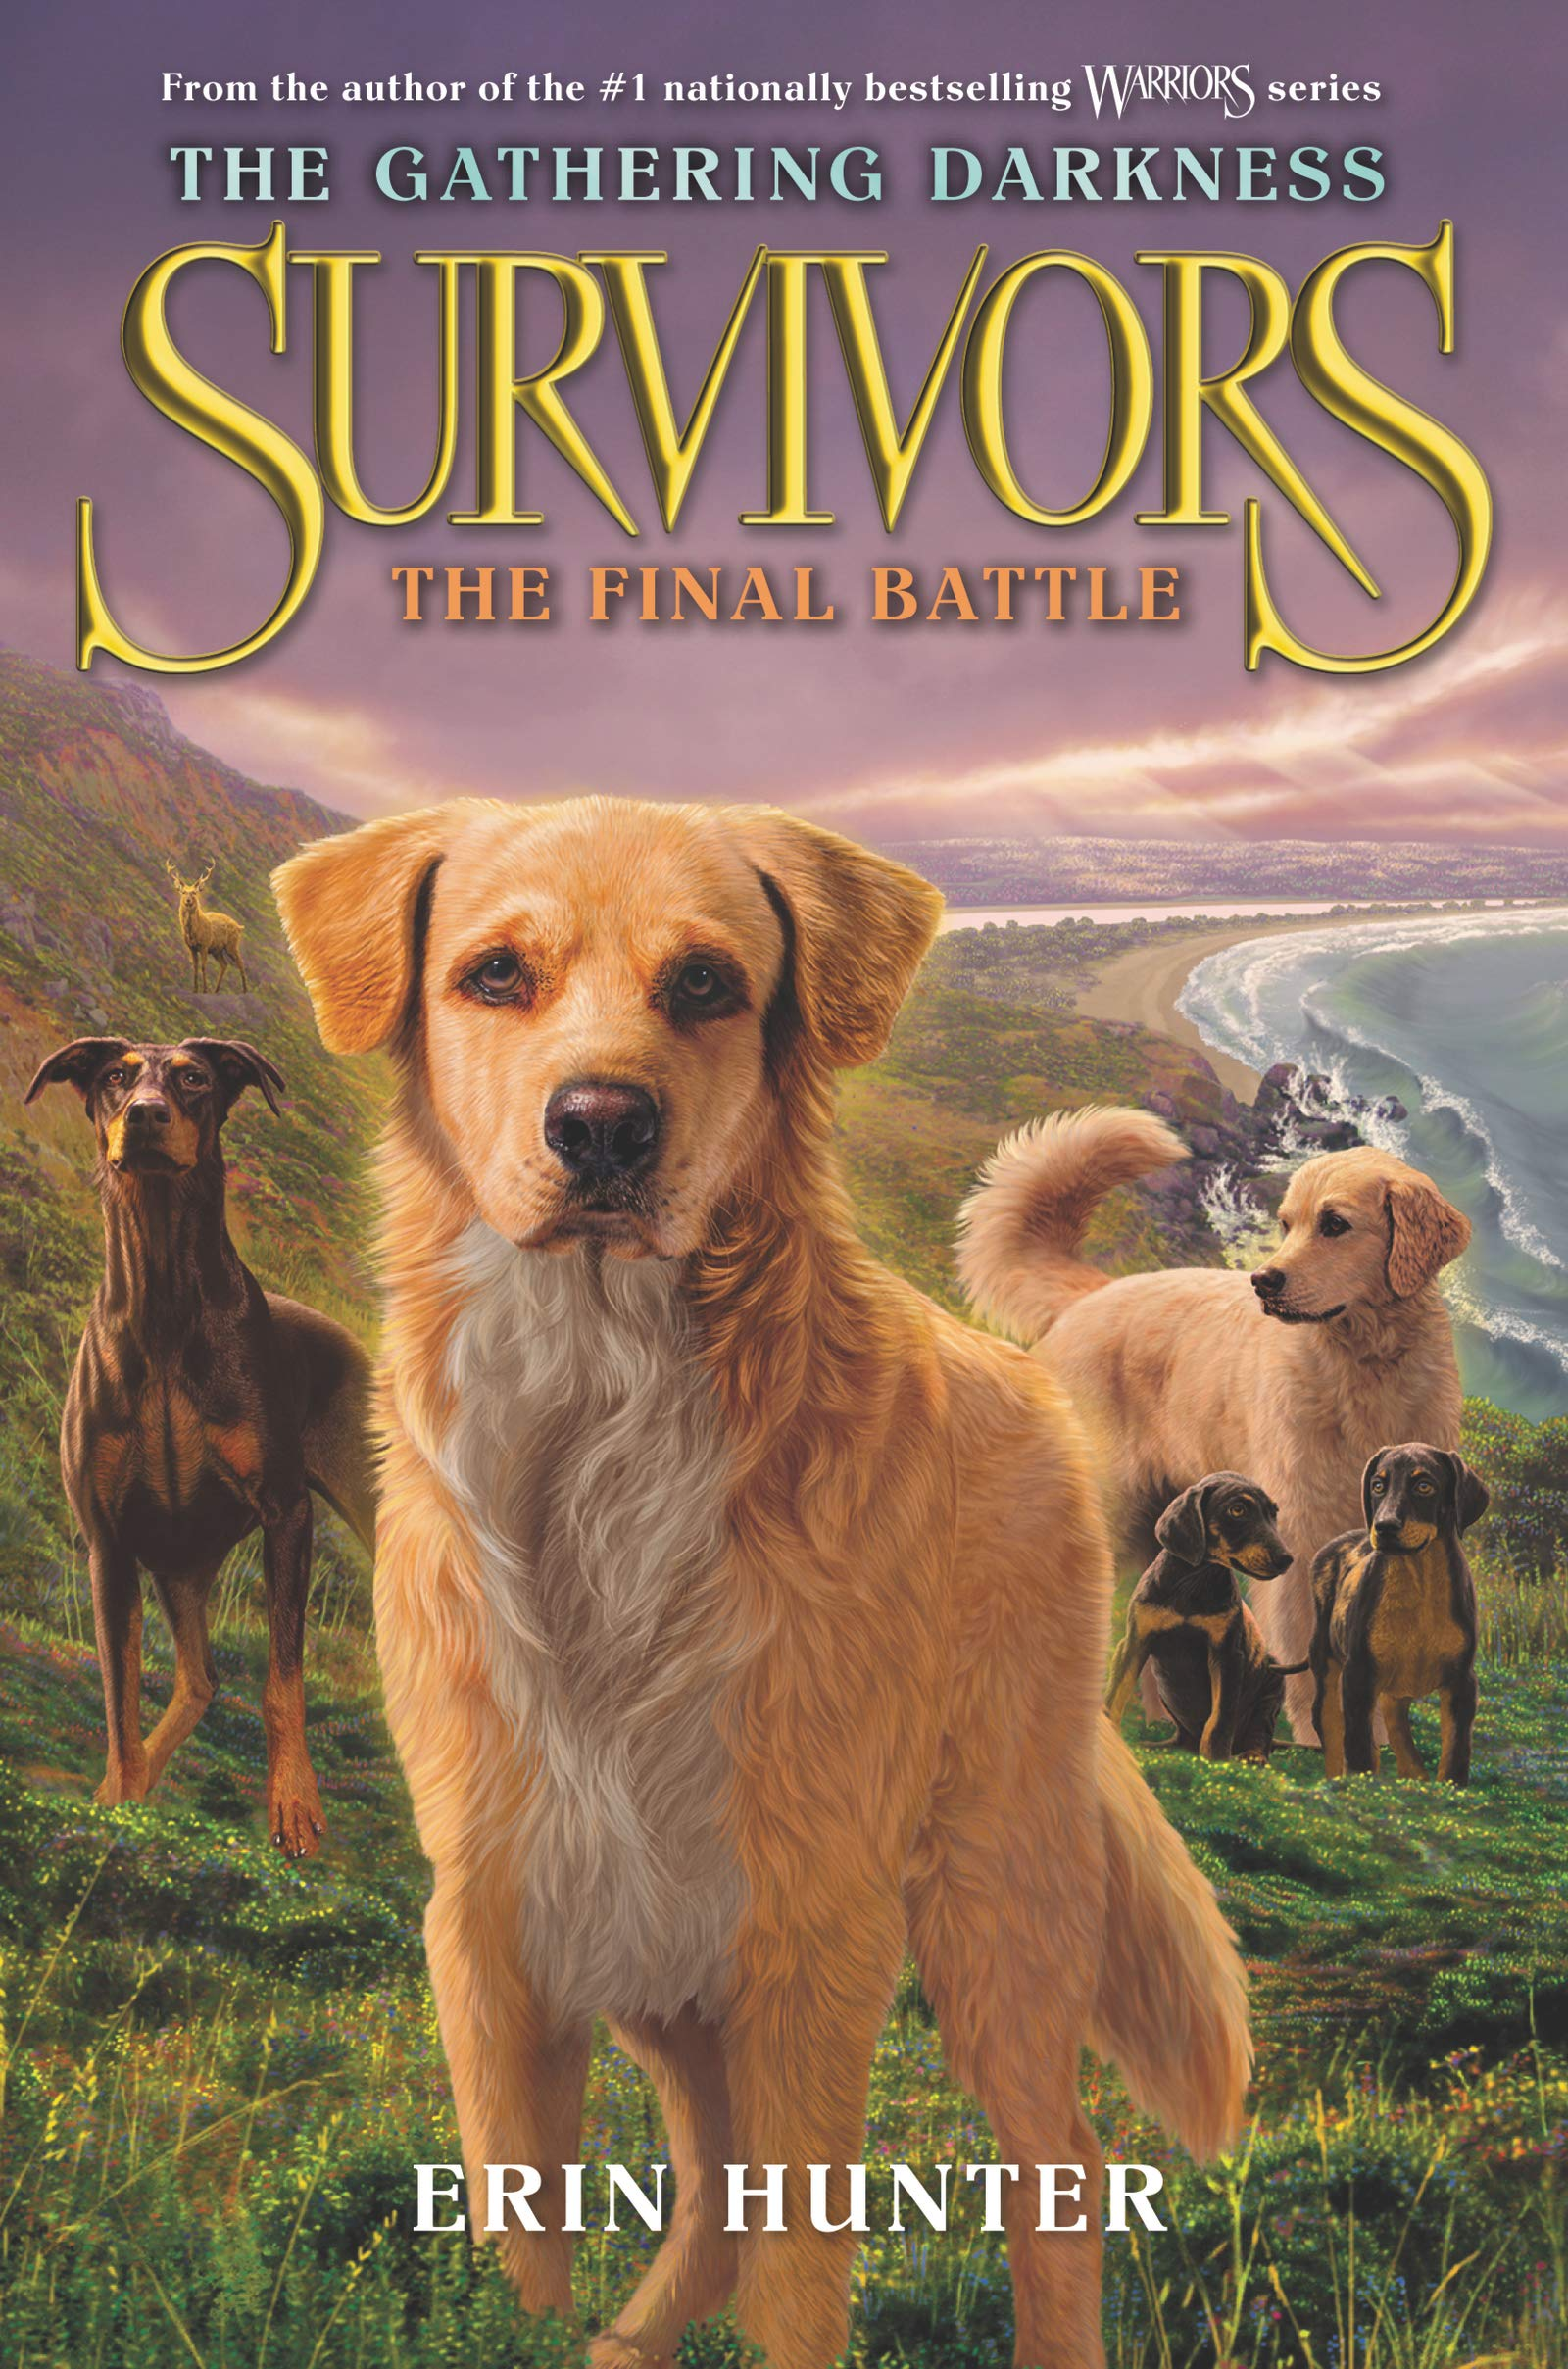 Survivors: The Gathering Darkness #6: The Final Battle: Hunter, Erin,  Kubinyi, Laszlo, Green, Julia: 9780062343543: Amazon.com: Books